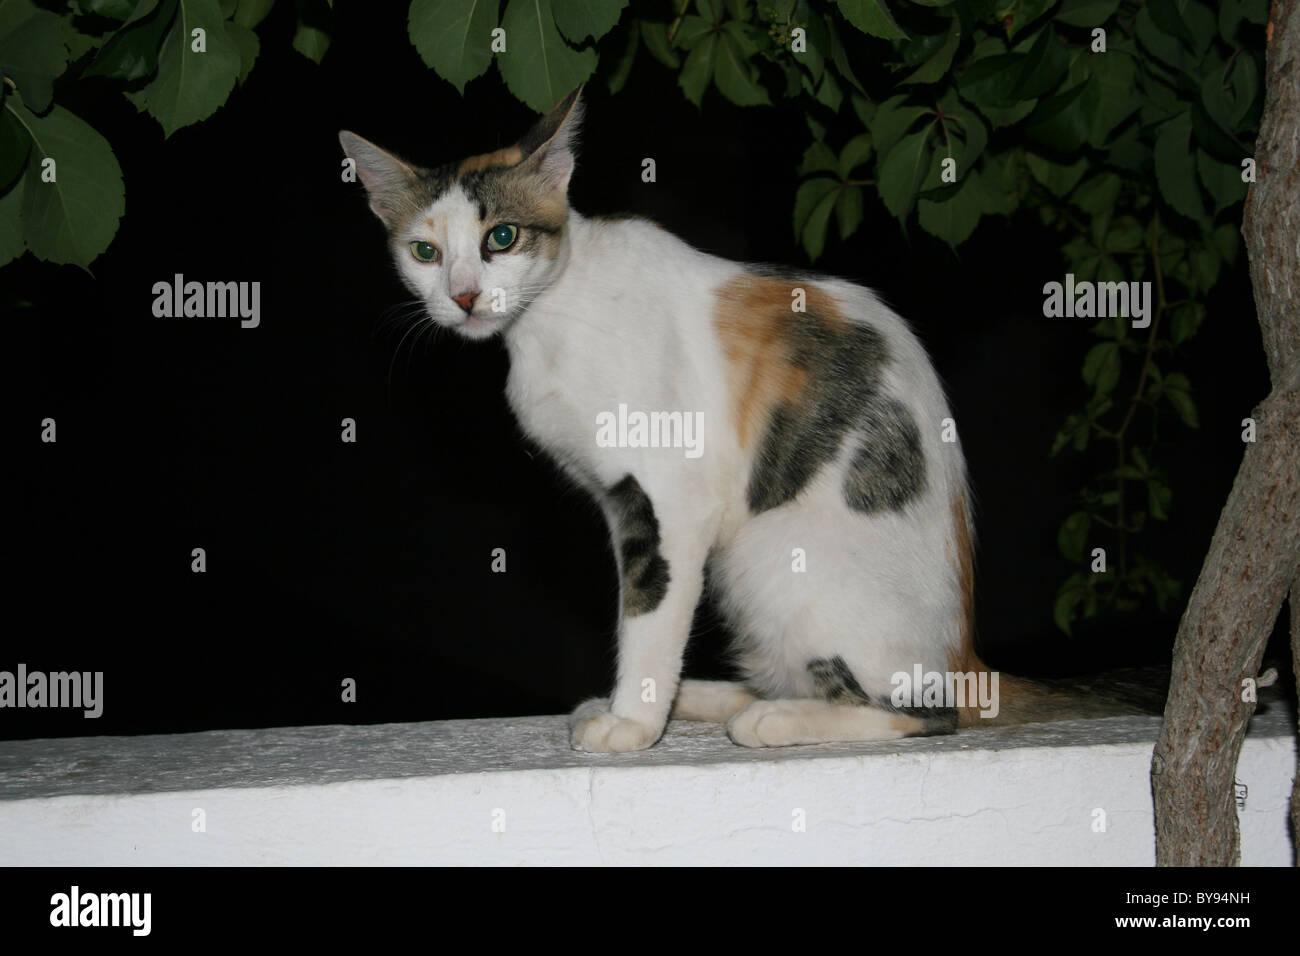 Cat sat on wall Stock Photo